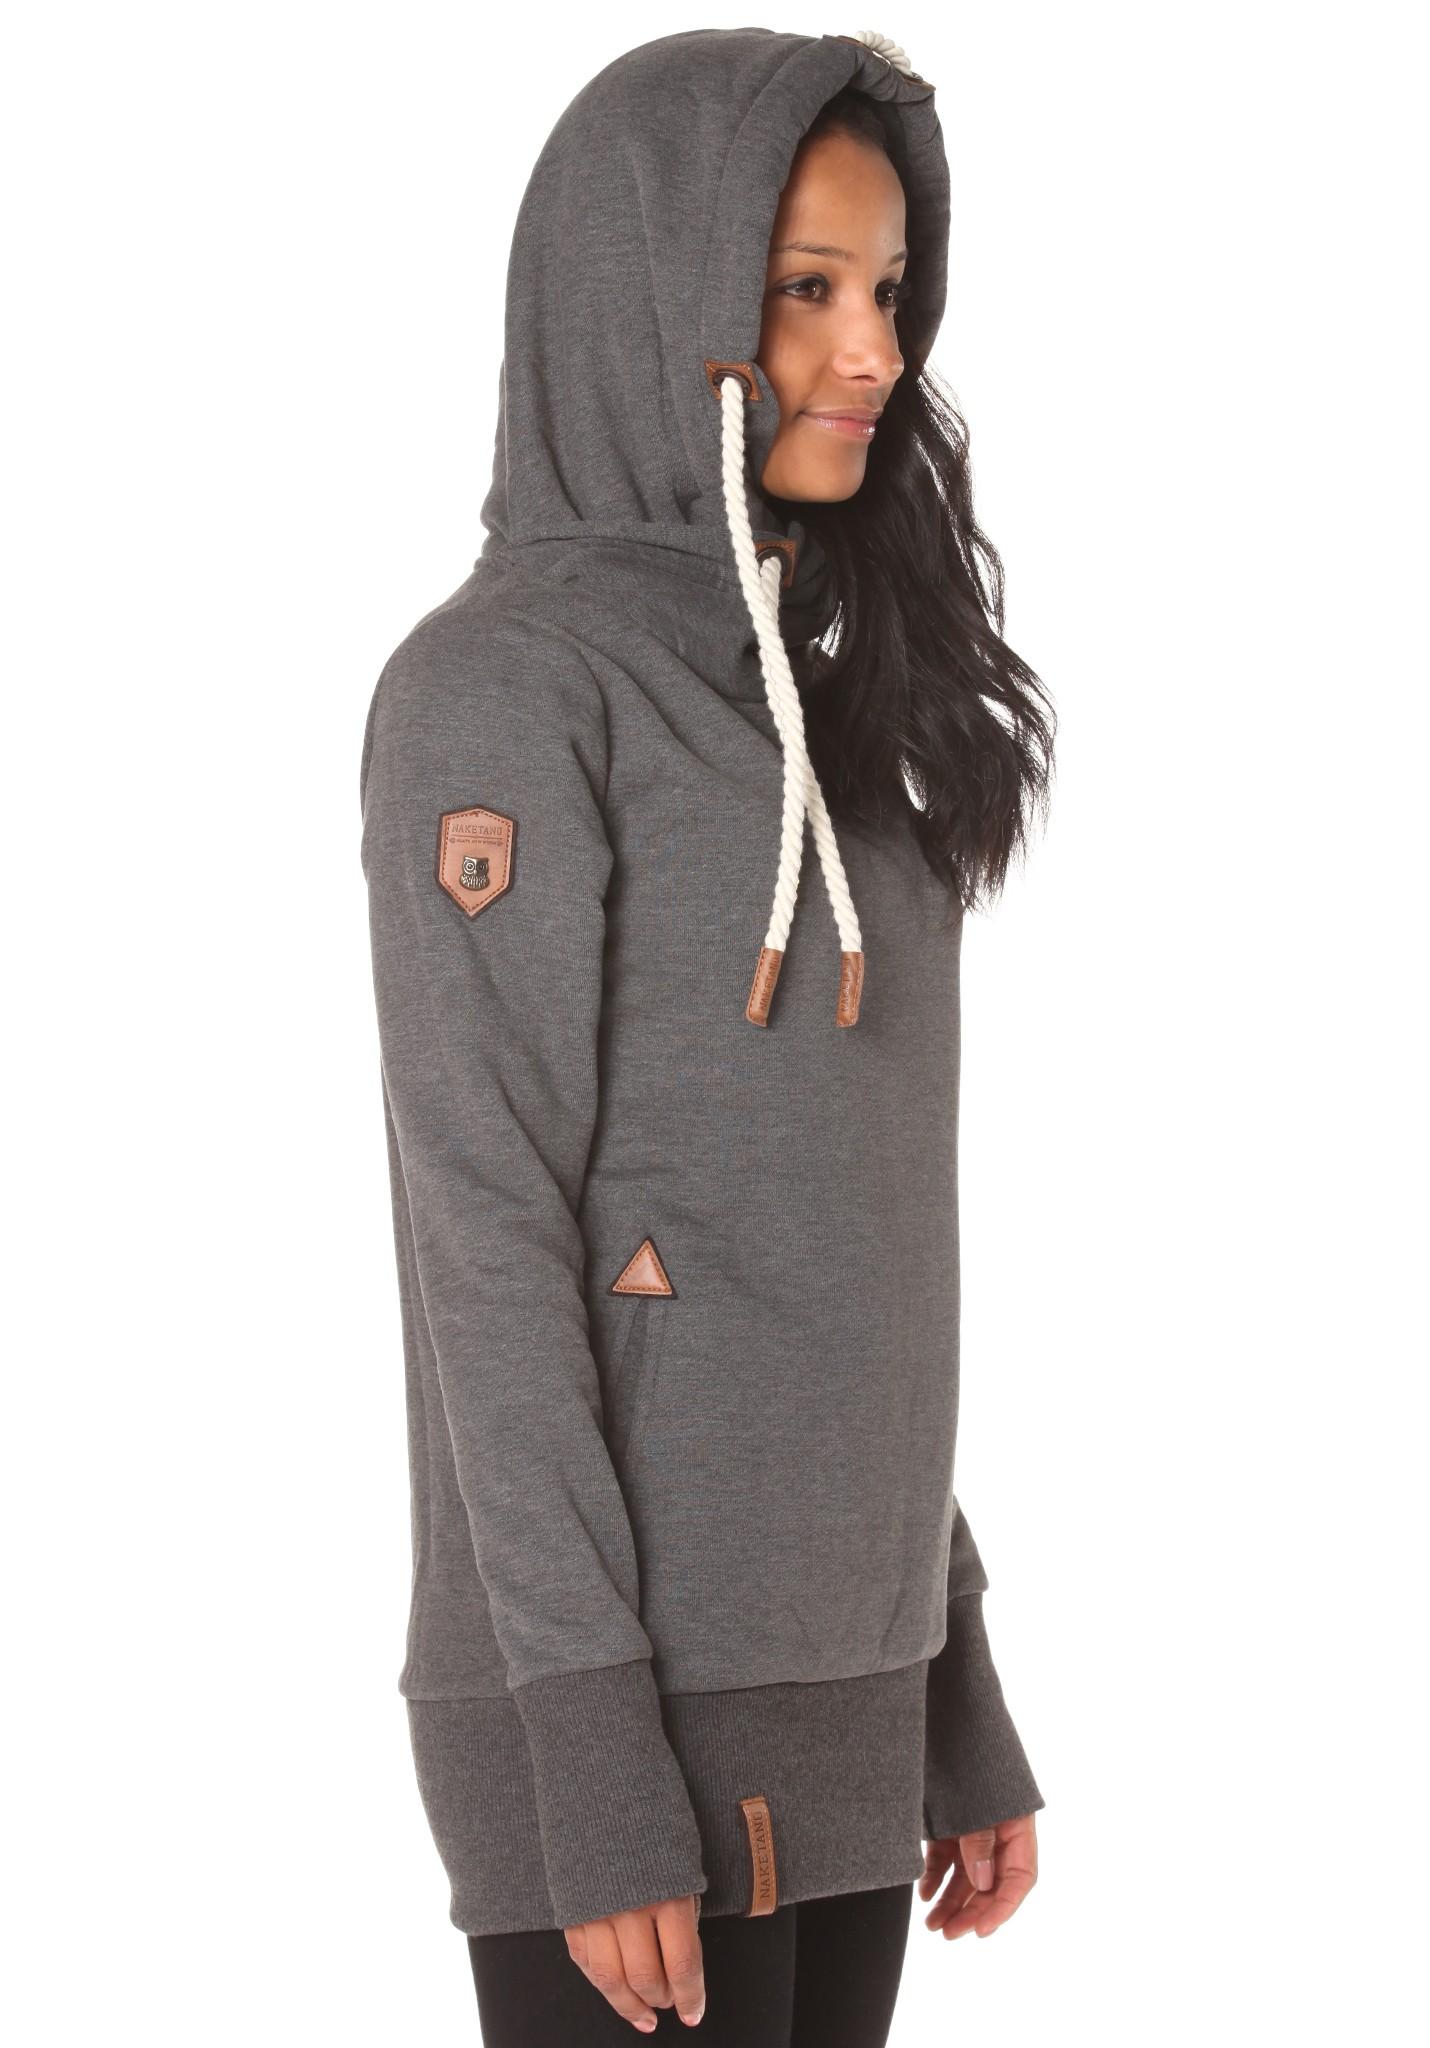 neu naketano darth long vi damen kapuzenpullover pullover hoodie kapuzenjacke ebay. Black Bedroom Furniture Sets. Home Design Ideas